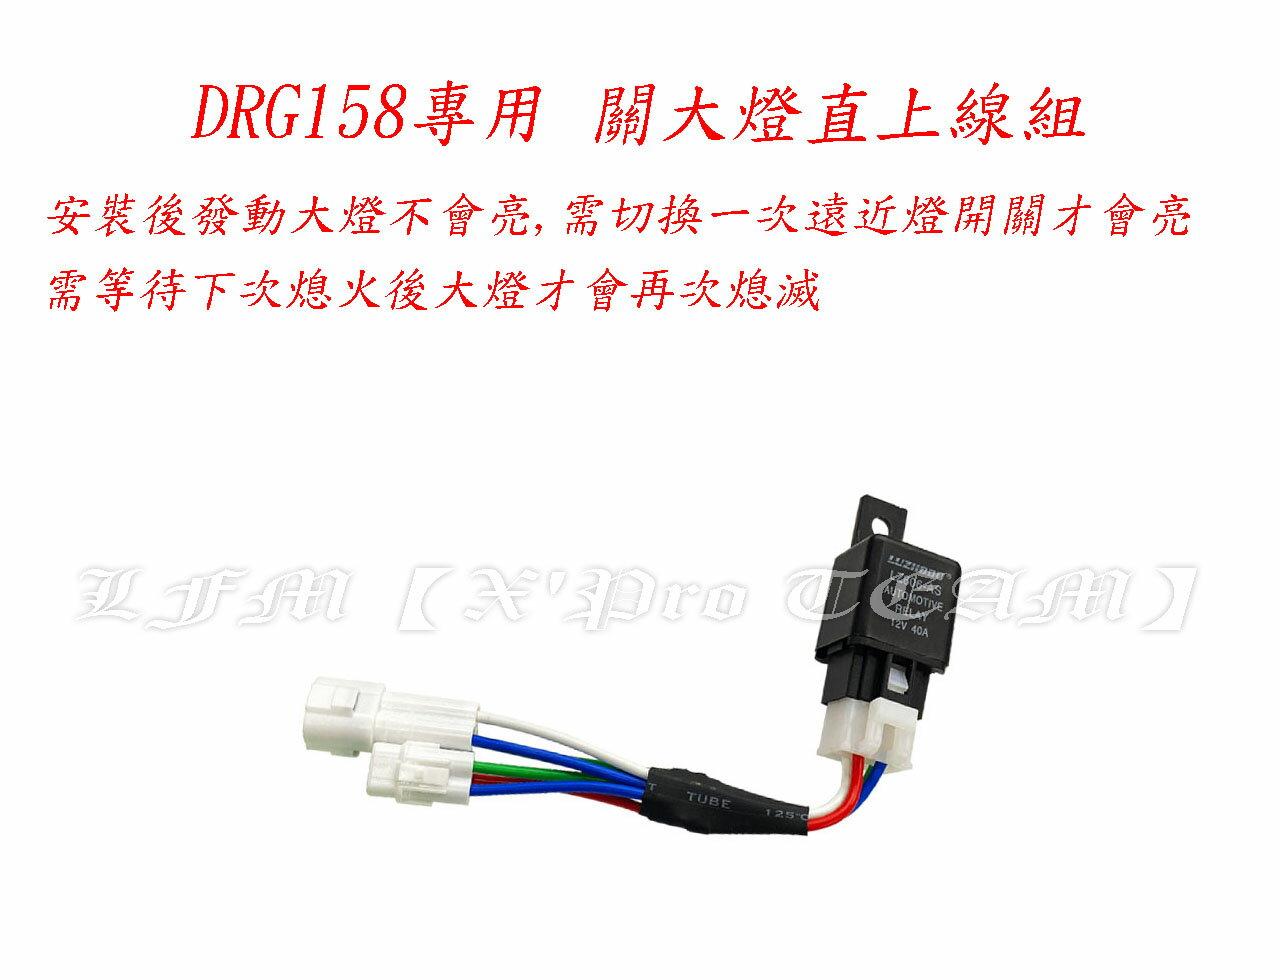 【LFM】DRG DRG158 專用 關大燈線組 直上 破解 解除 全時點燈